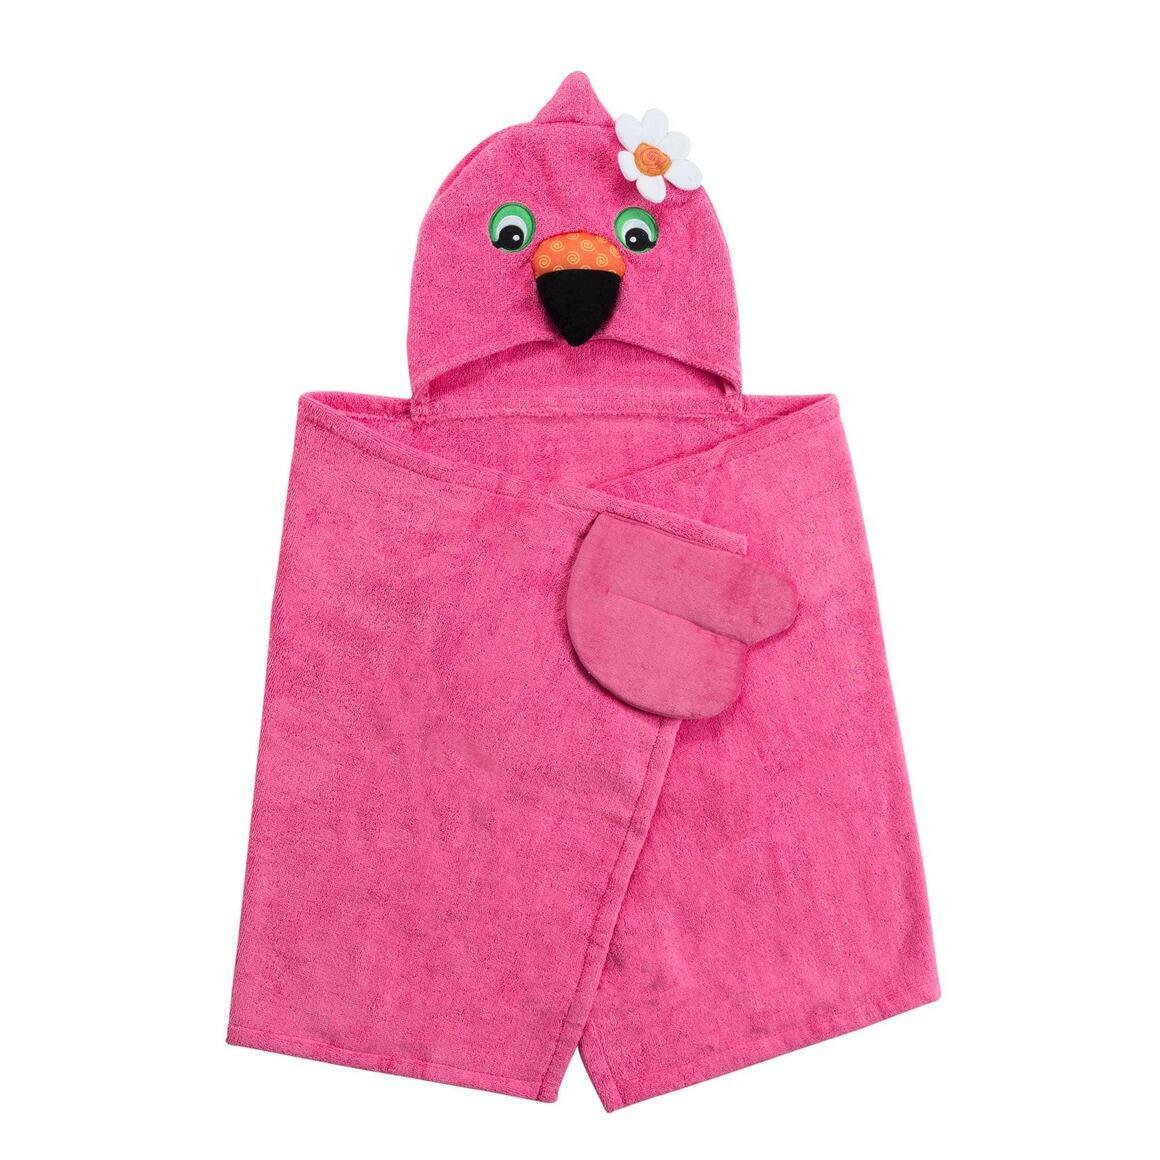 Franny the Flamingo Toddler Towel | Trada Marketplace